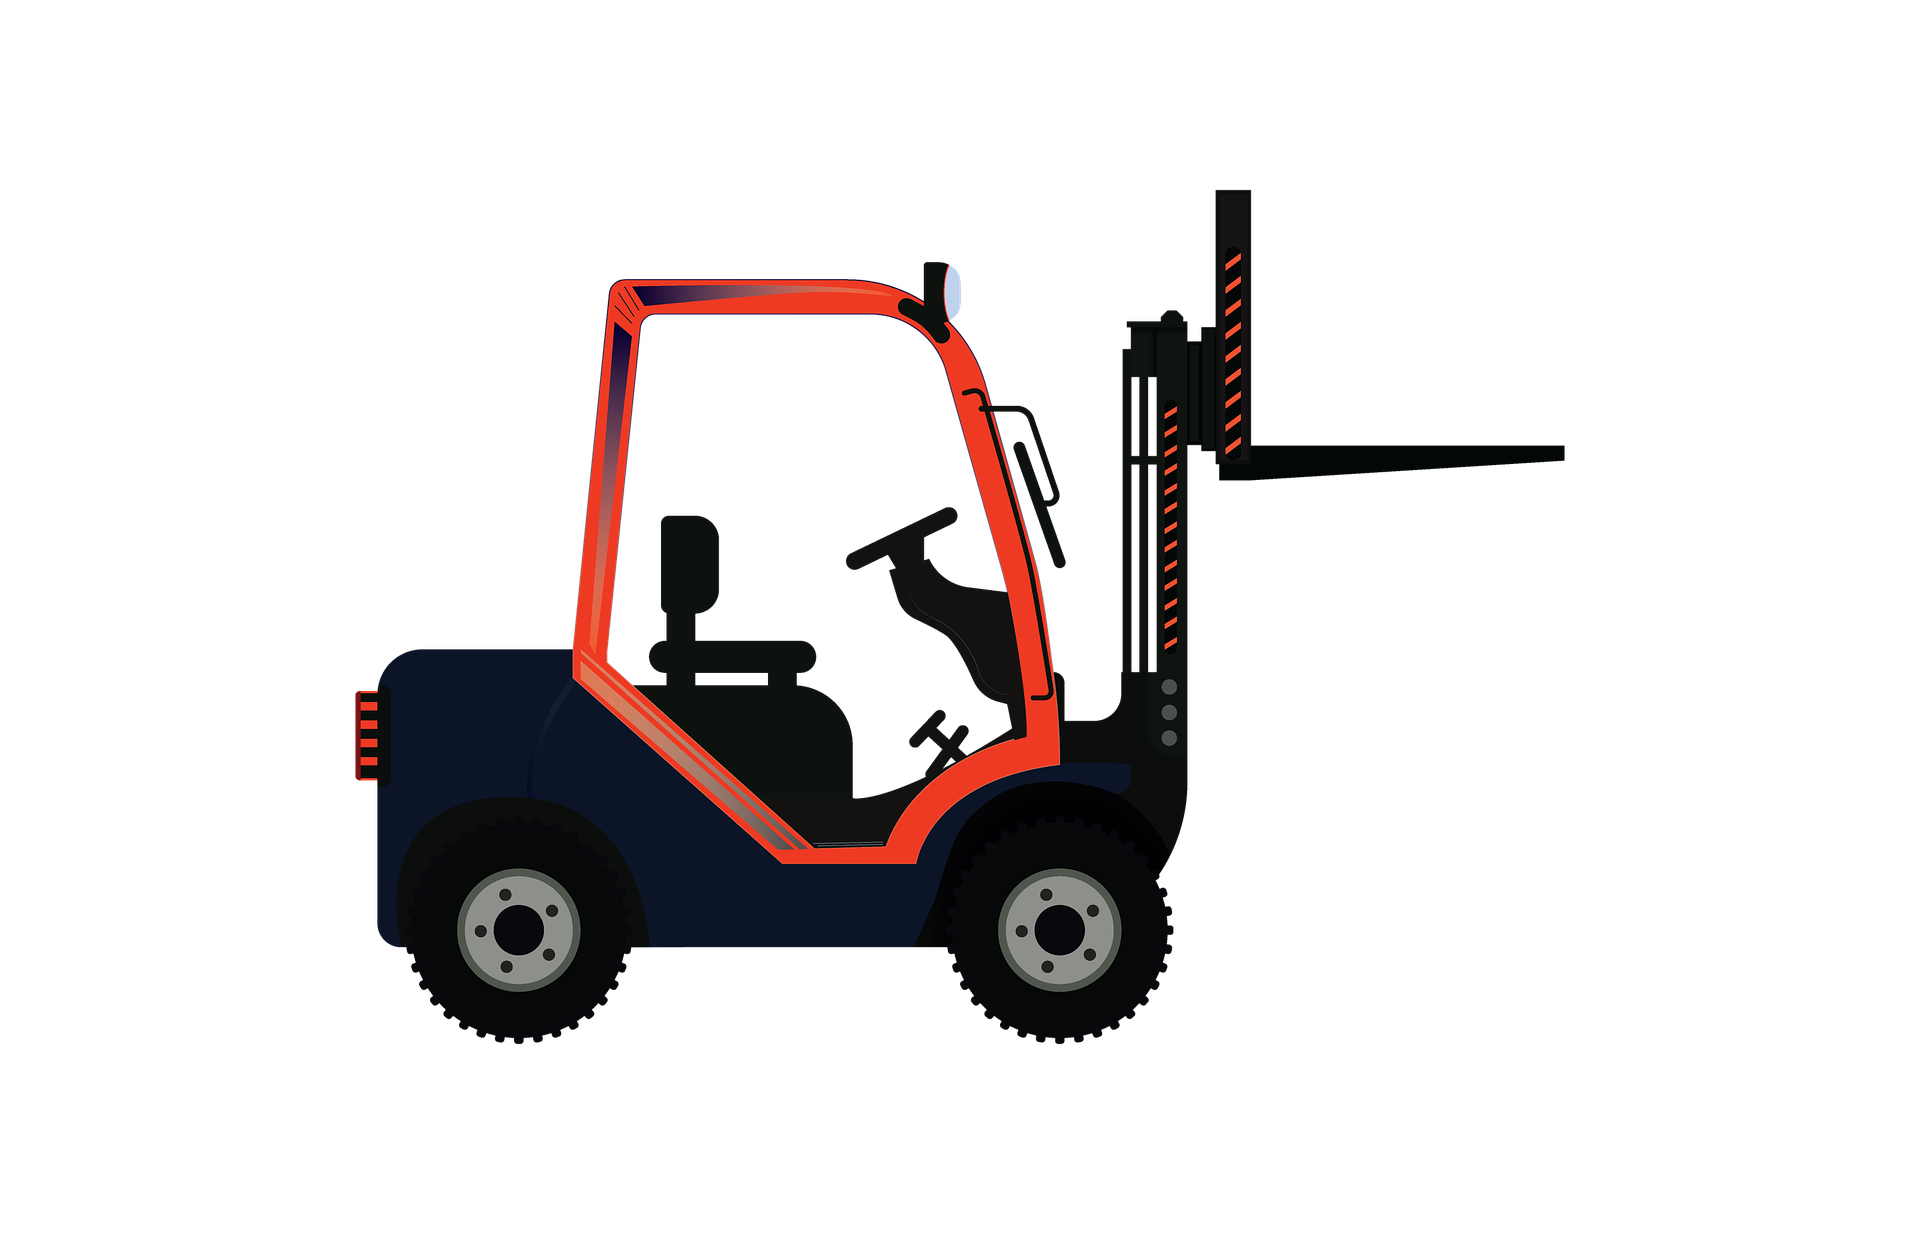 vehicle-2834812_1920